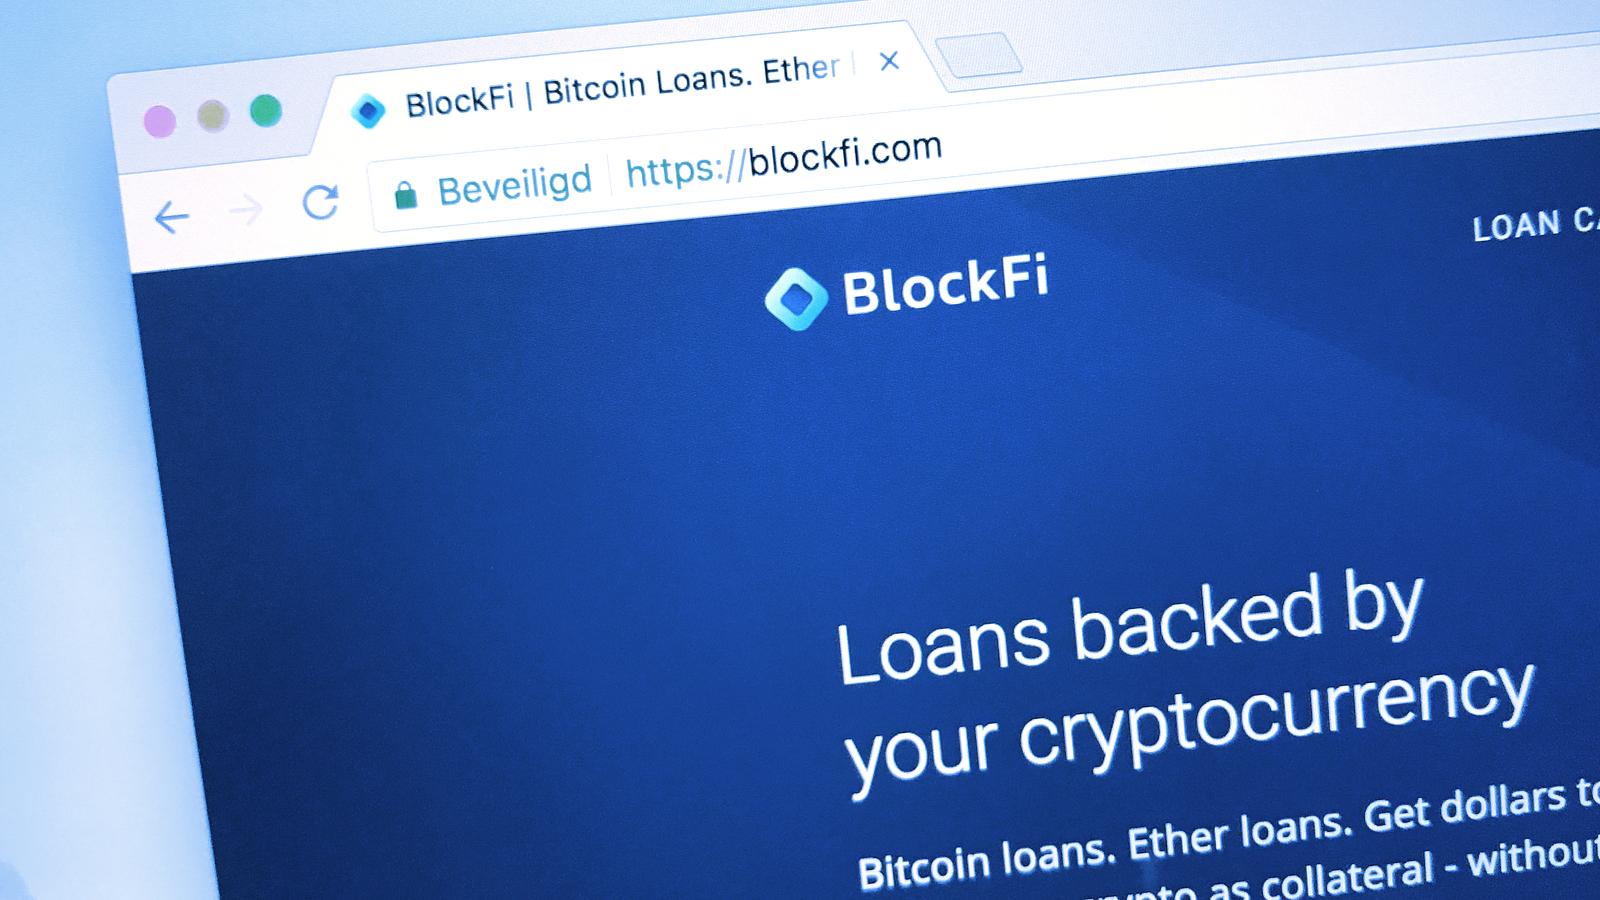 Alabama Regulators Suggest BlockFi's Bitcoin Accounts Are 'Unregistered Securities'